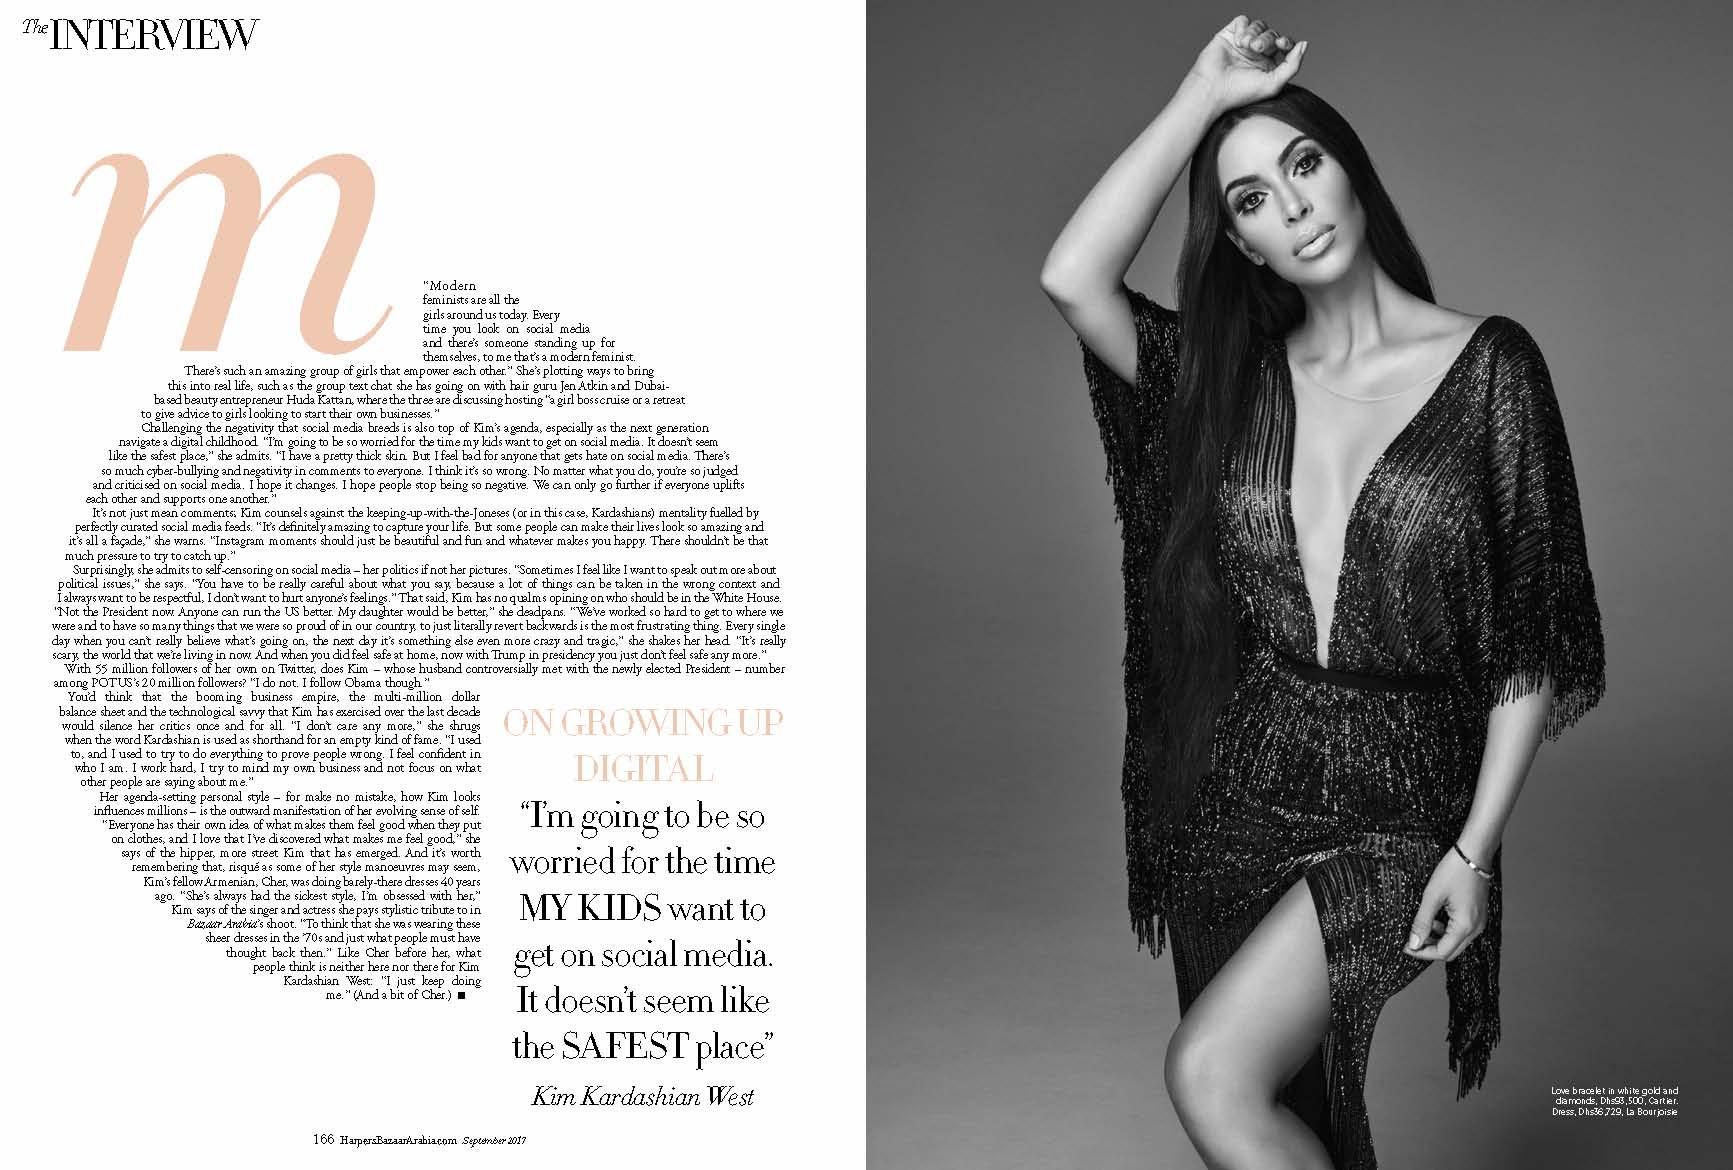 Kim Kardashian West, September 2017 6.jpg